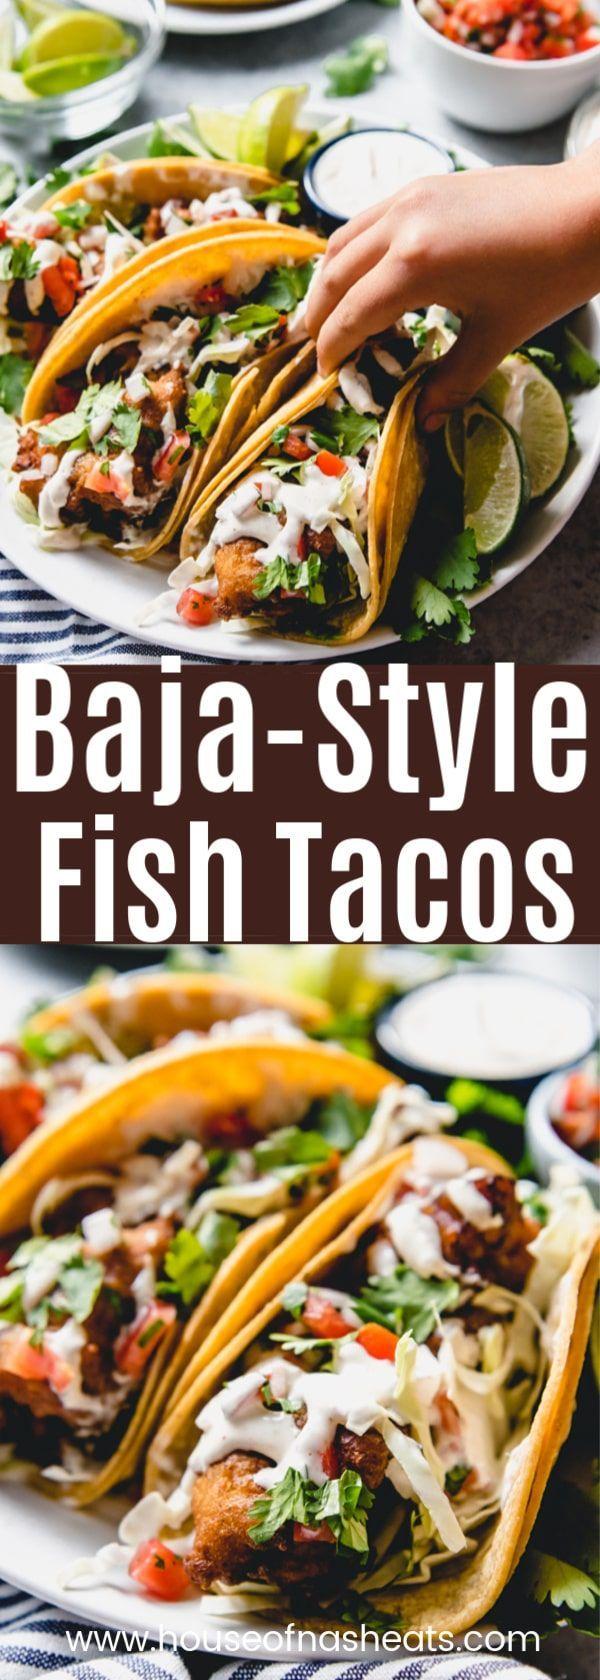 Photo of Baja Fish Tacos Recipe